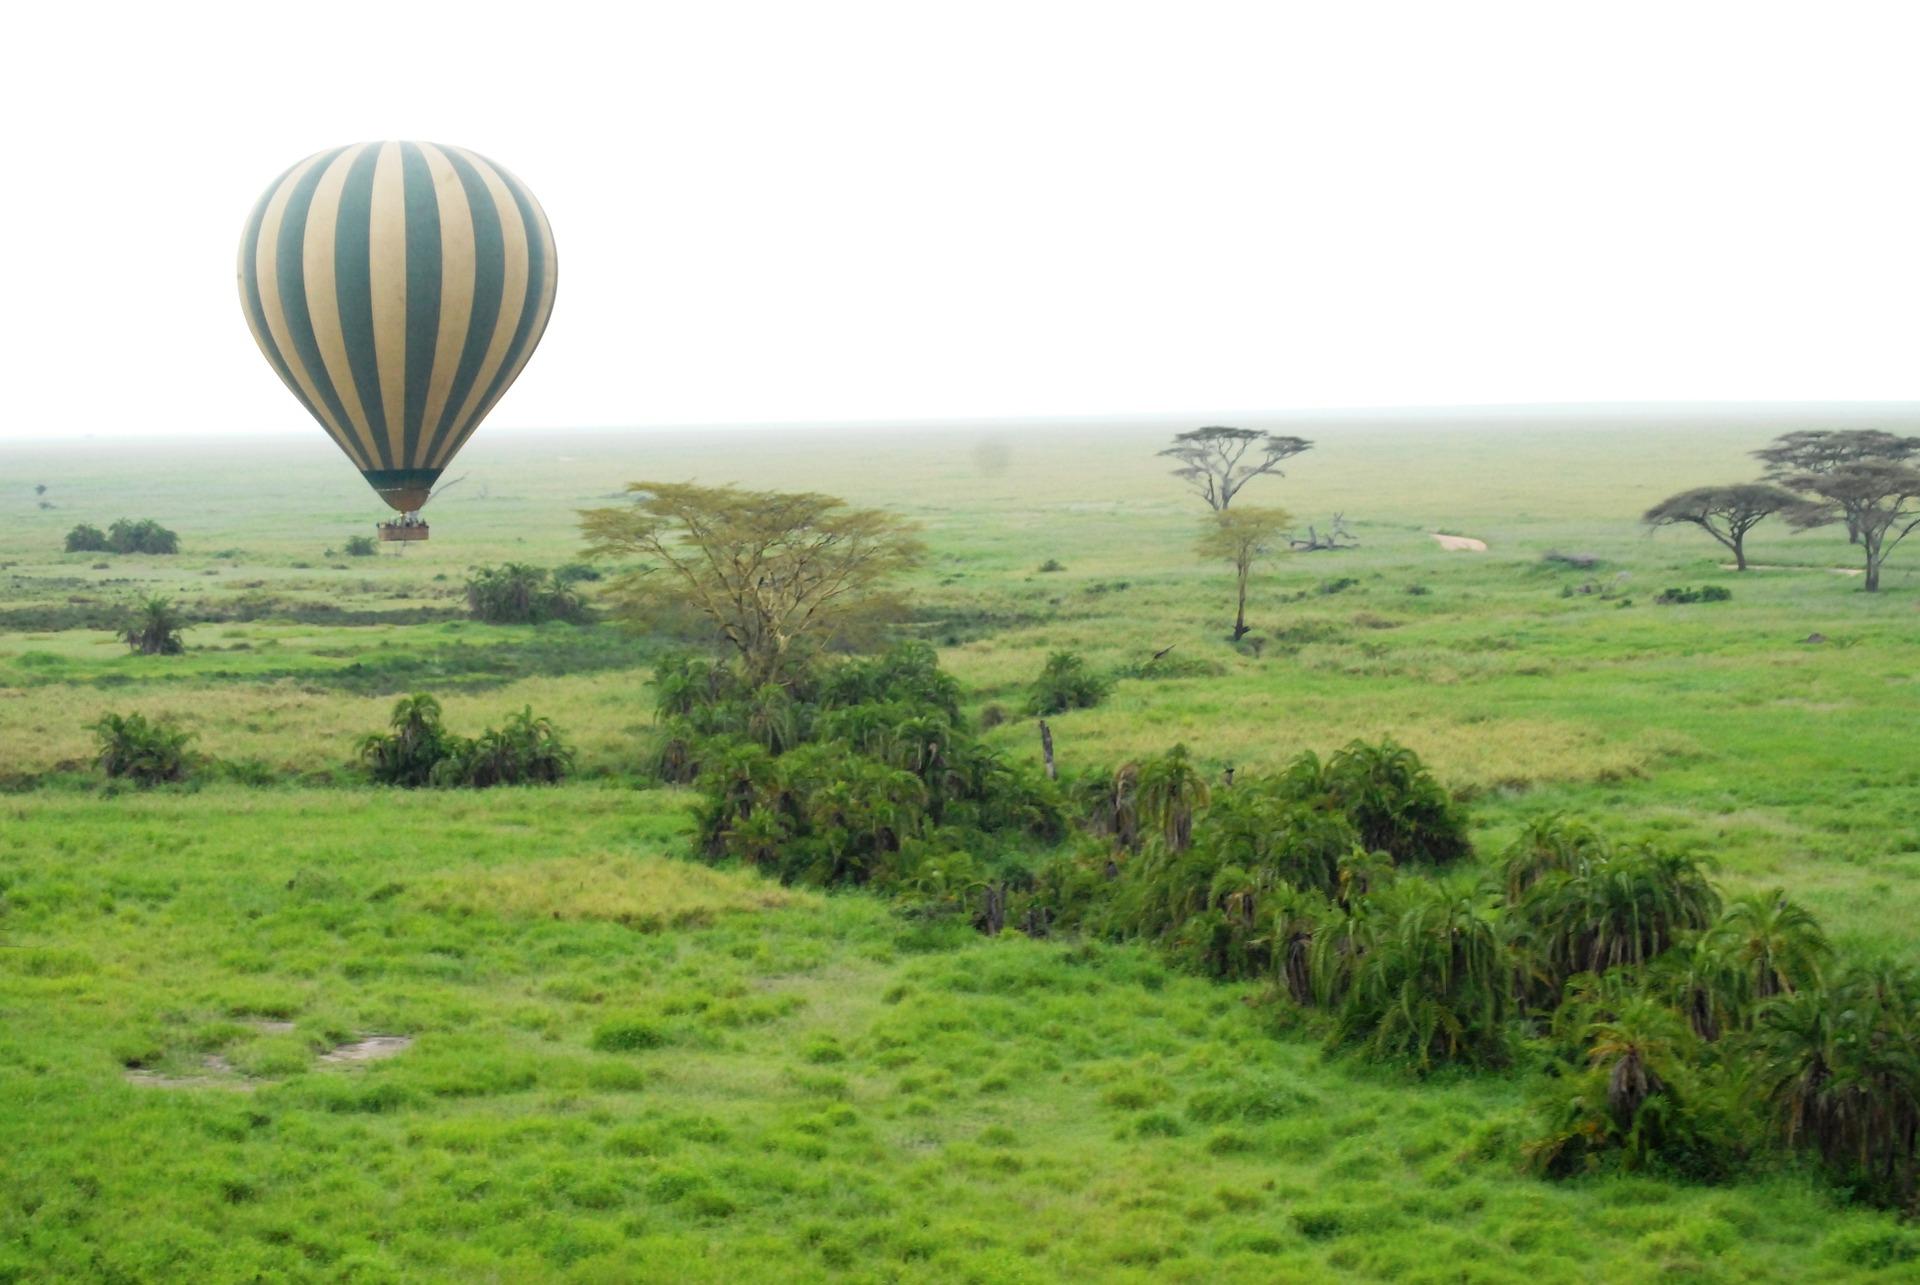 Ballooning in the Serengeti.  Image via